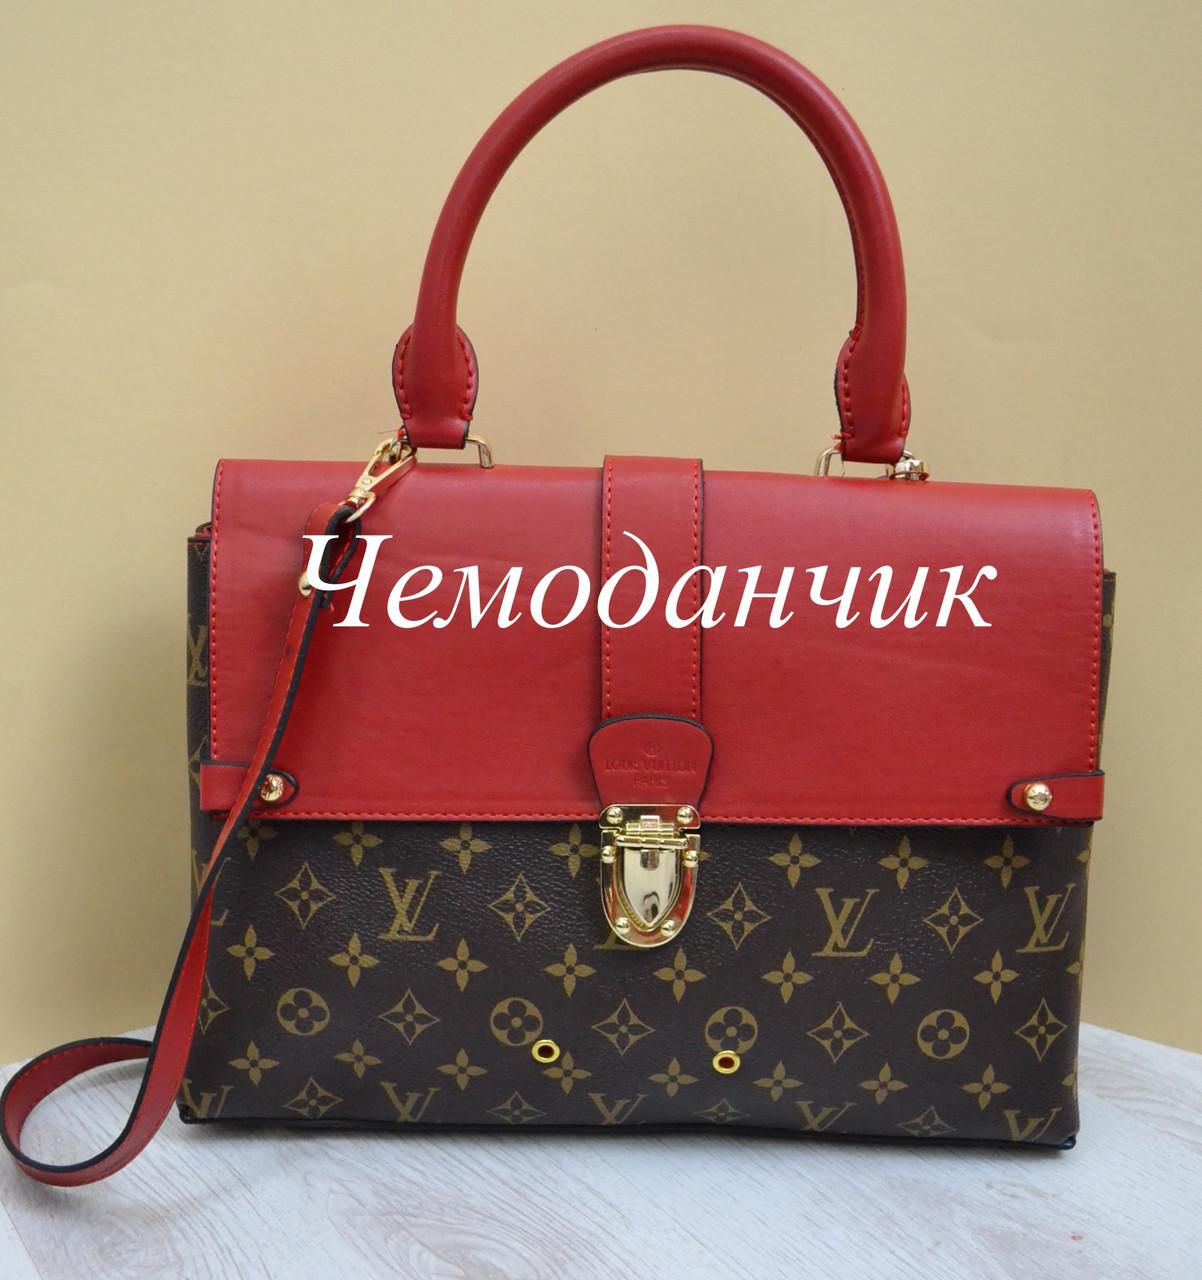 a15a94f31b9a СУМКА ЛУИ ВИТОН Louis Vuitton новинка в расцветках 2 - ЧЕМОДАНЧИК - самые  красивые сумочки по